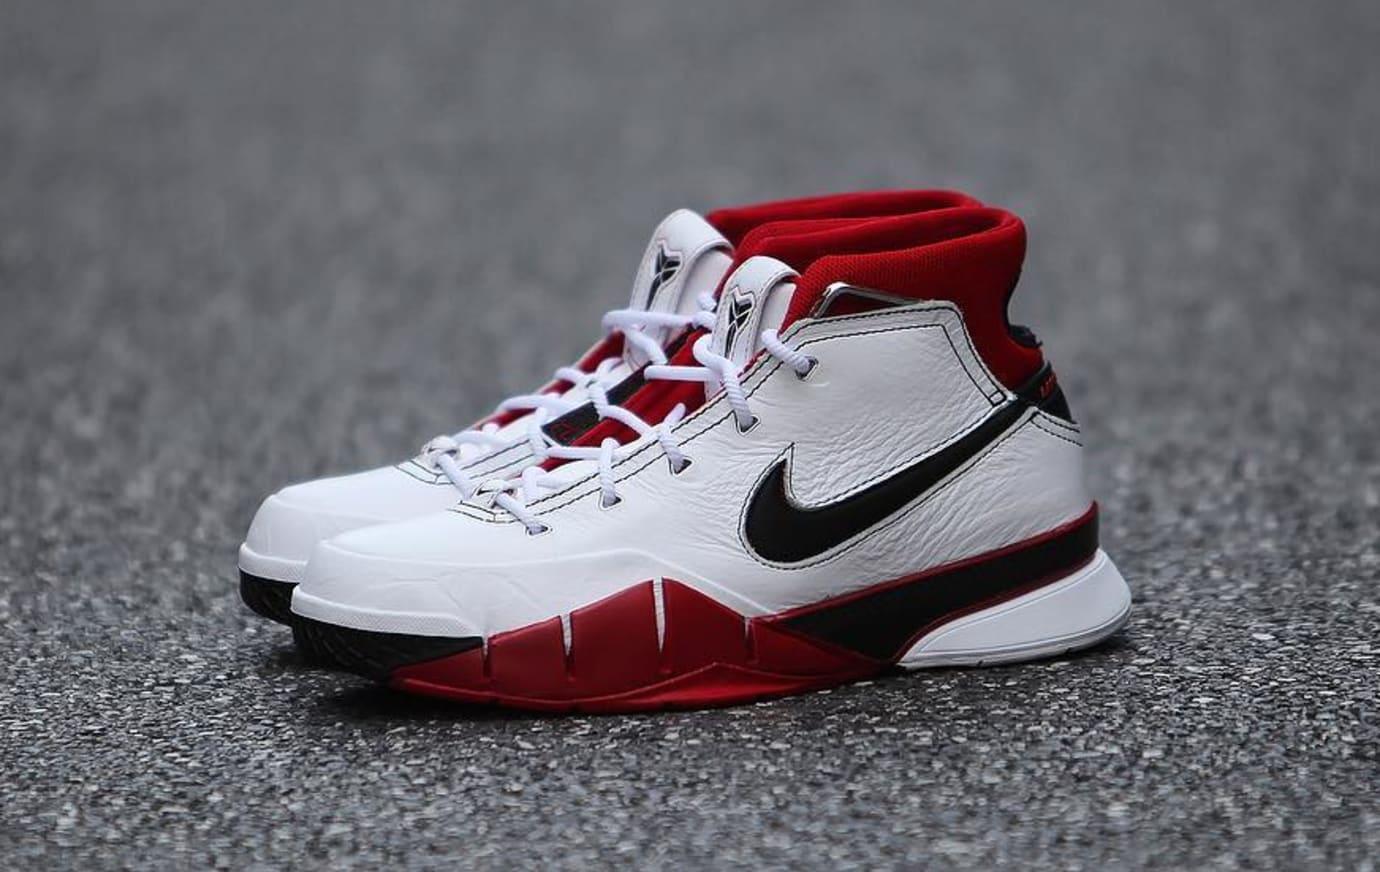 Nike Zoom Kobe 1 Protro All-Star Release Date AQ2728-102 Side